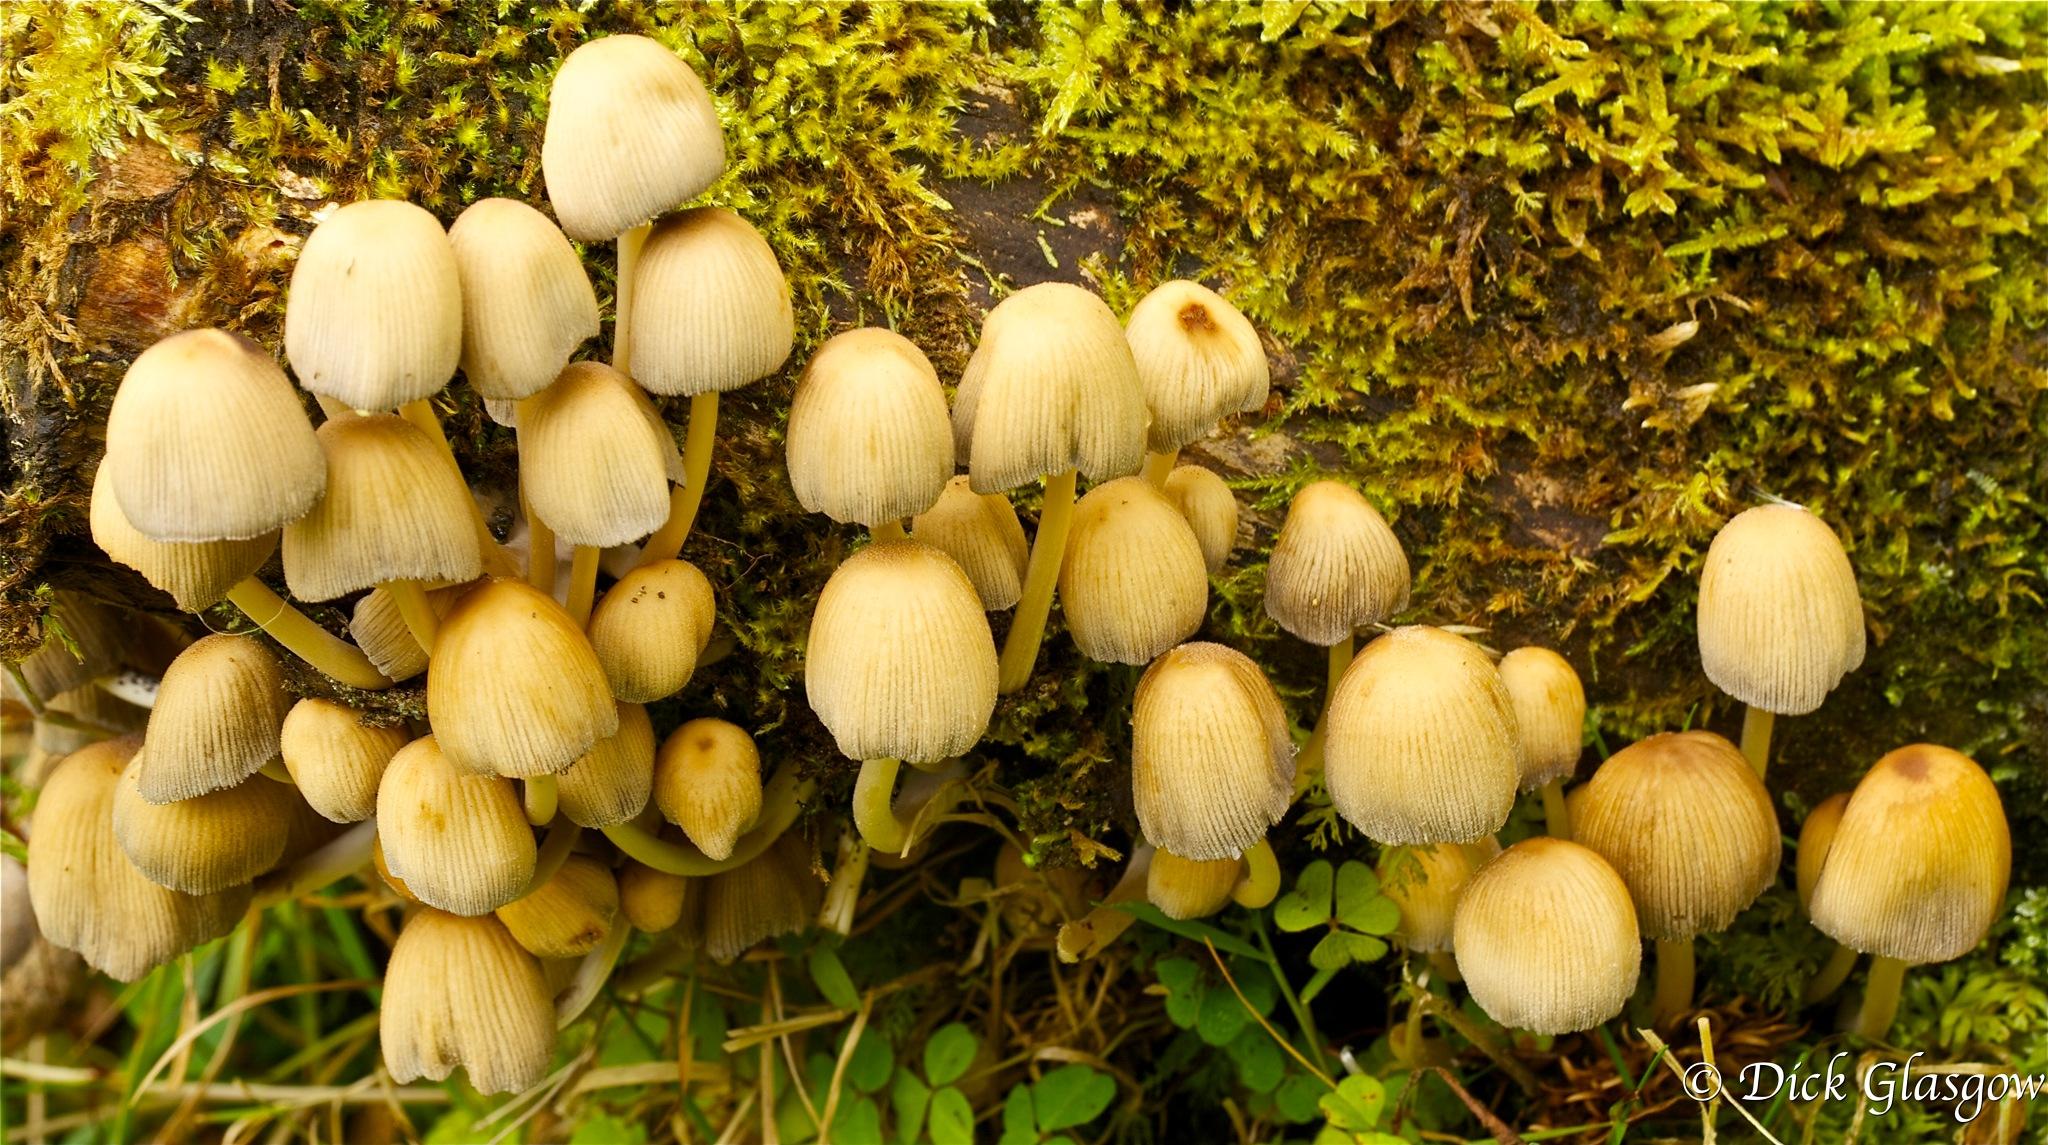 Many Mushrooms by Dick Glasgow